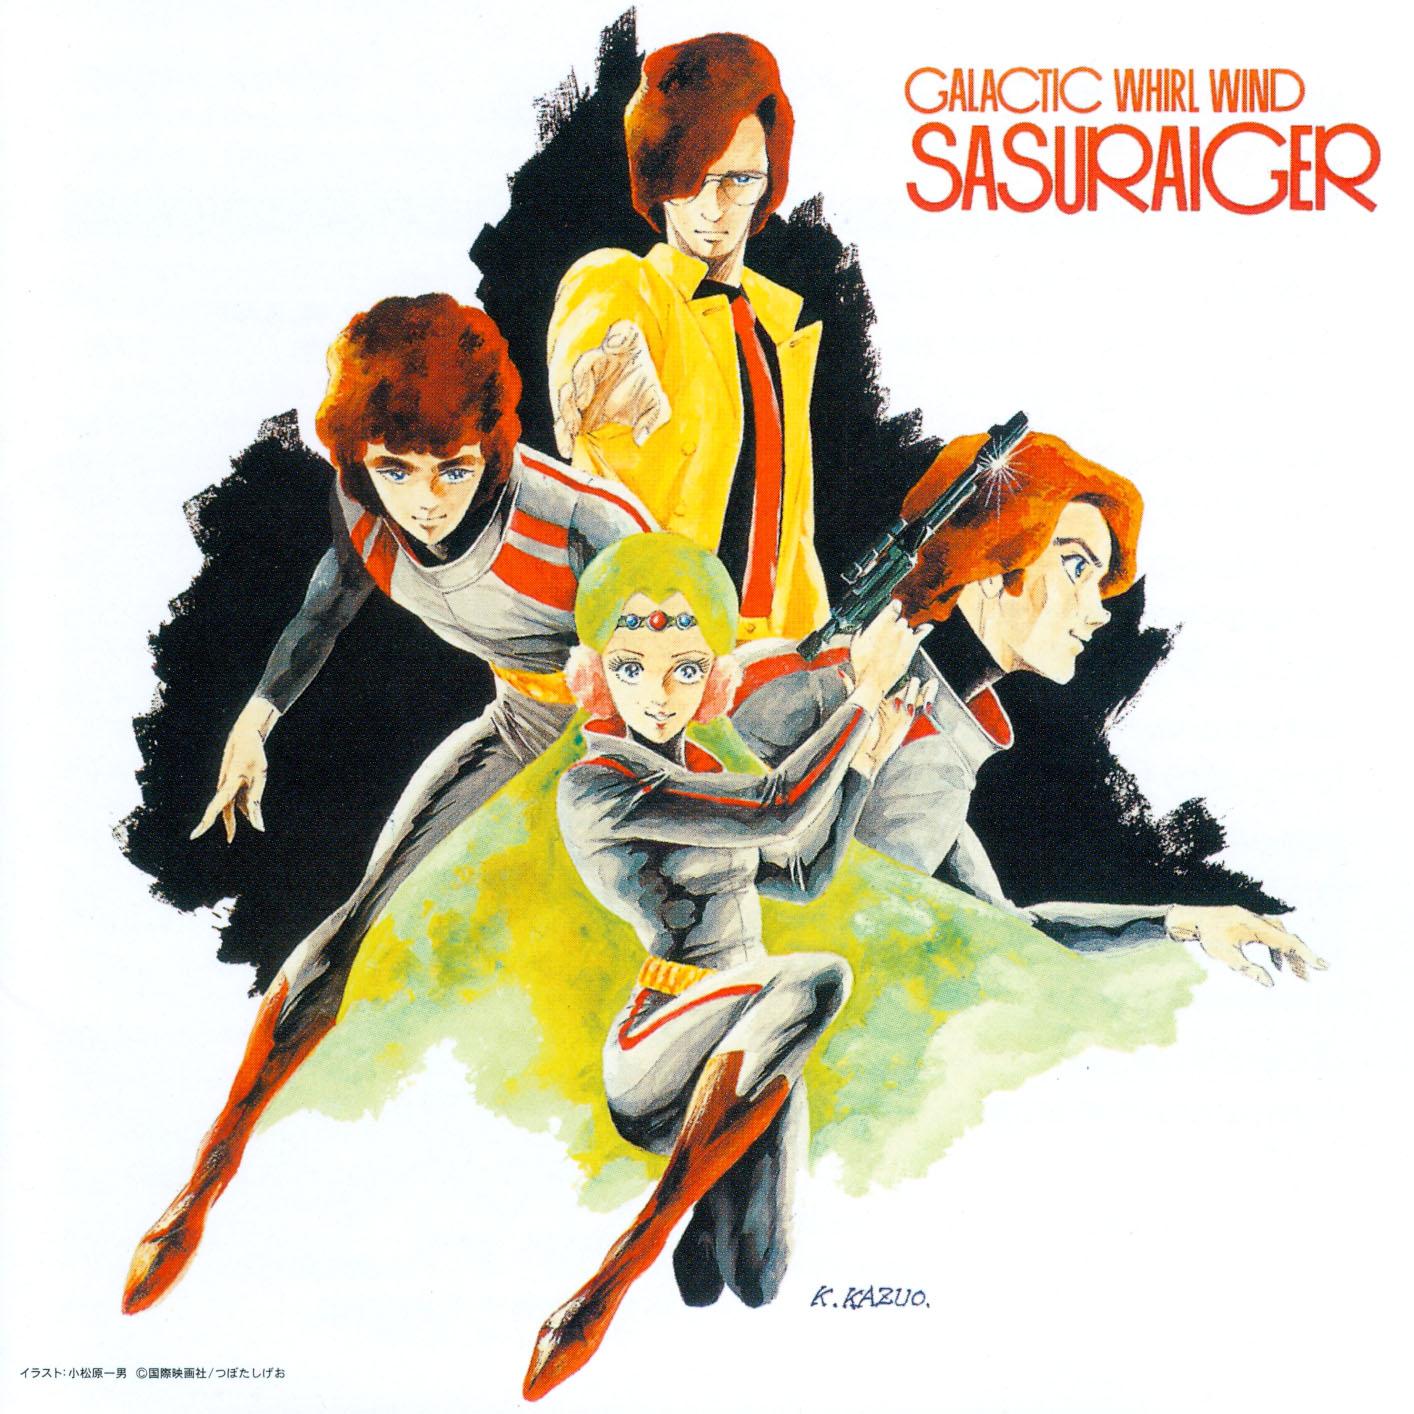 J9 (Bryger, Baxingar, Sasuraiger) & Friends (Galvion, Acrobunch, Baldios) Music Collection 1981-1984 | 12 CD | FLAC